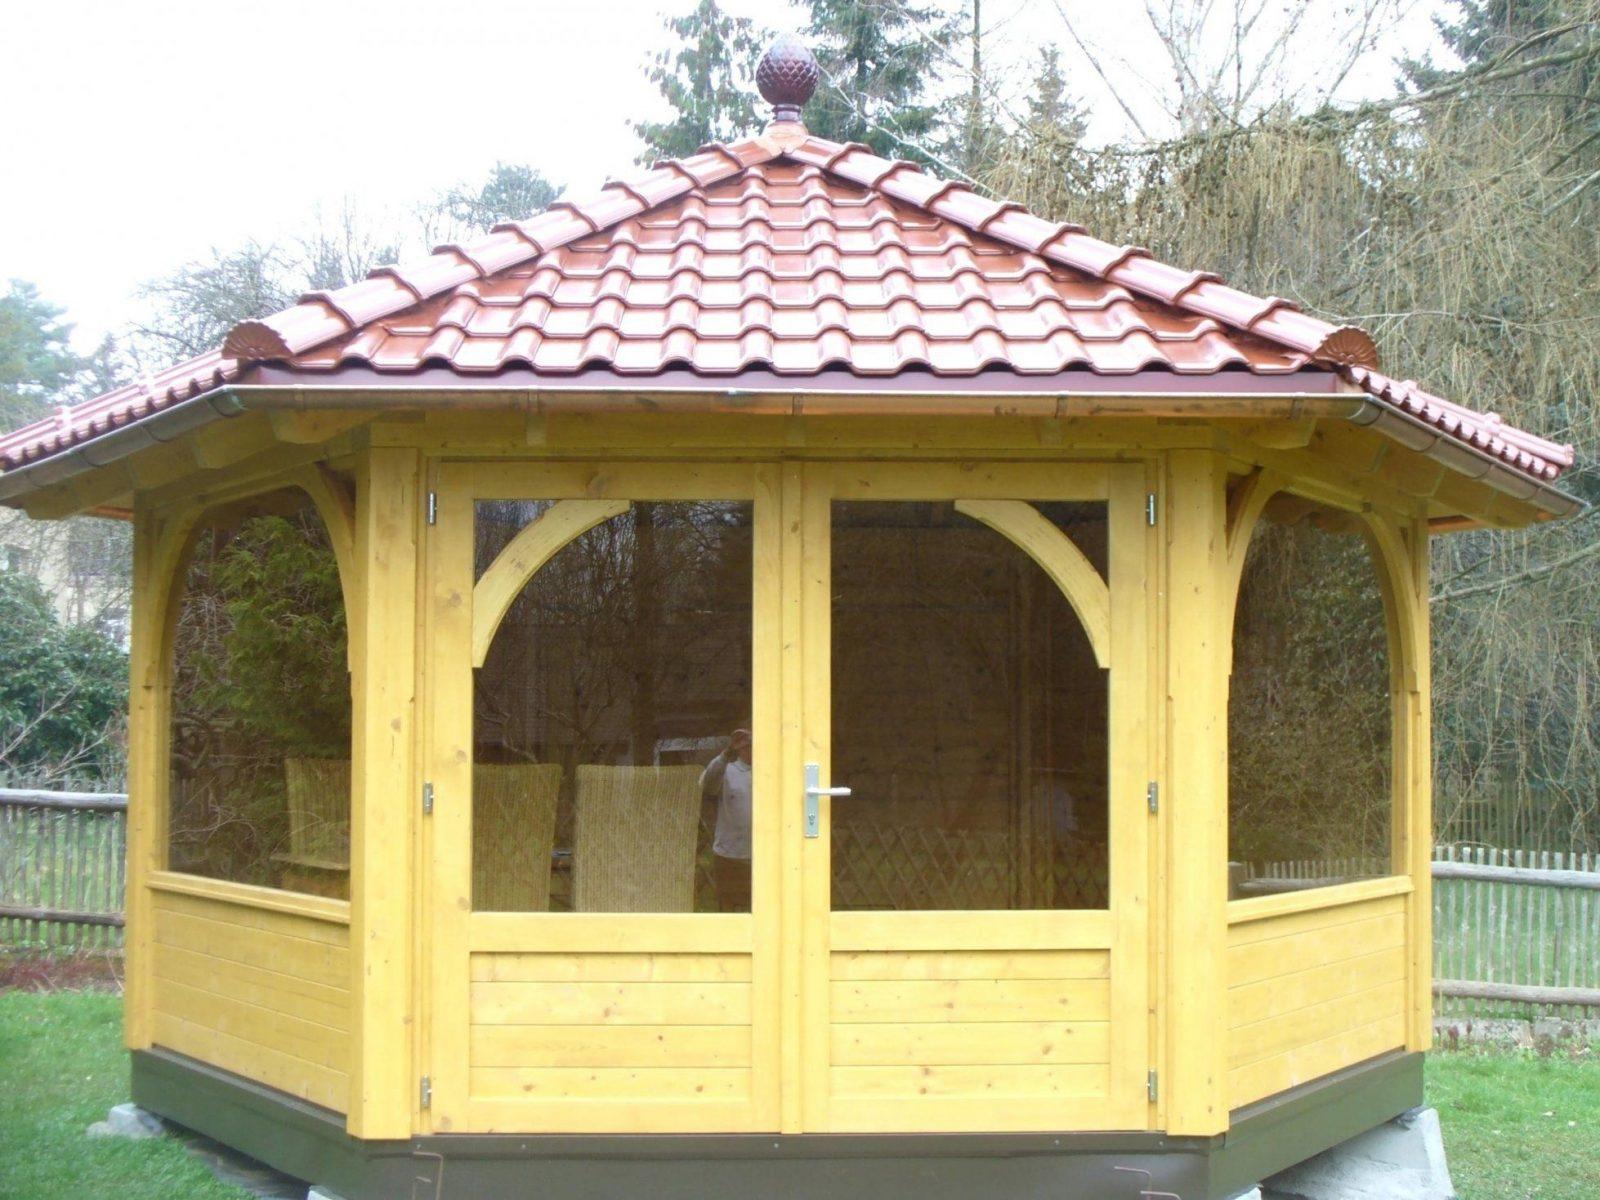 Unique Holz Pavillon 3A—4 Flachdach Selber Bauen 6 3A4 7 Gartenmobel von Pavillon Selber Bauen Flachdach Bild